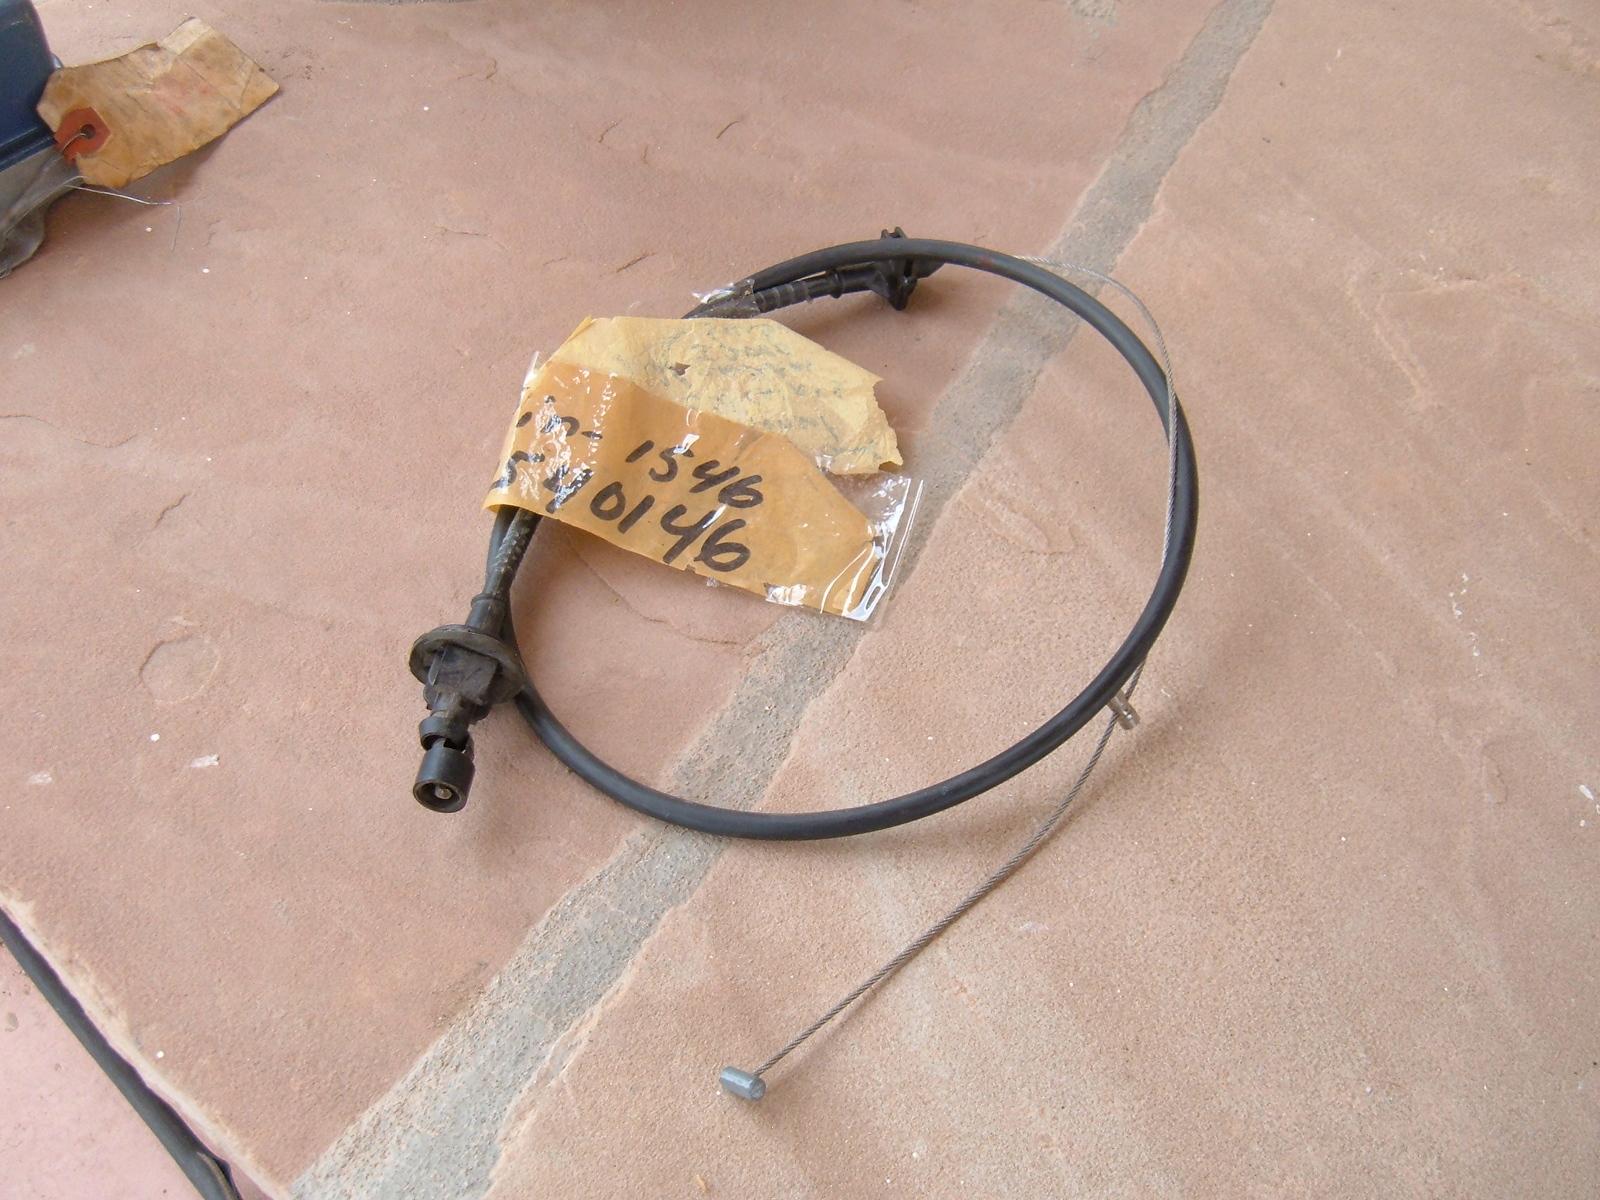 1988 89 90 91 buick pontiac oldsmobile accelerator cable nos gm # 22540146 (z 22540146)